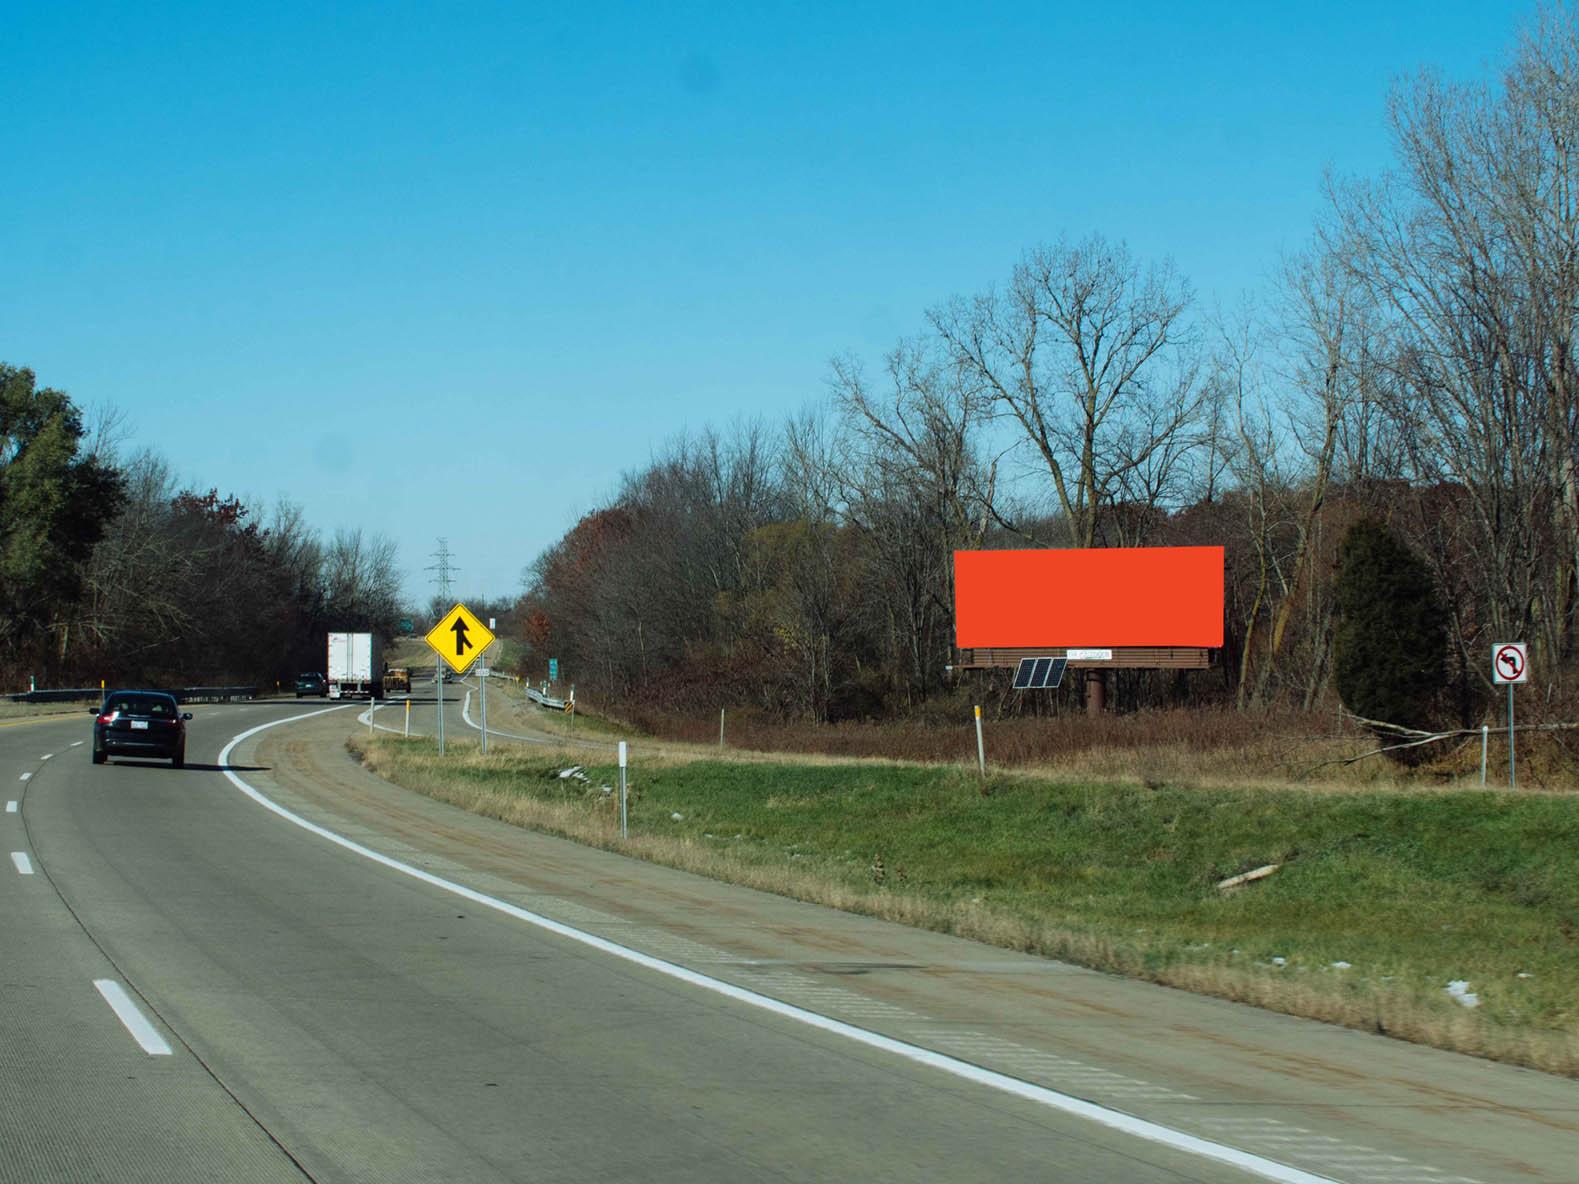 Billboard 252 East (14 x 48) - Geopath: 30655493